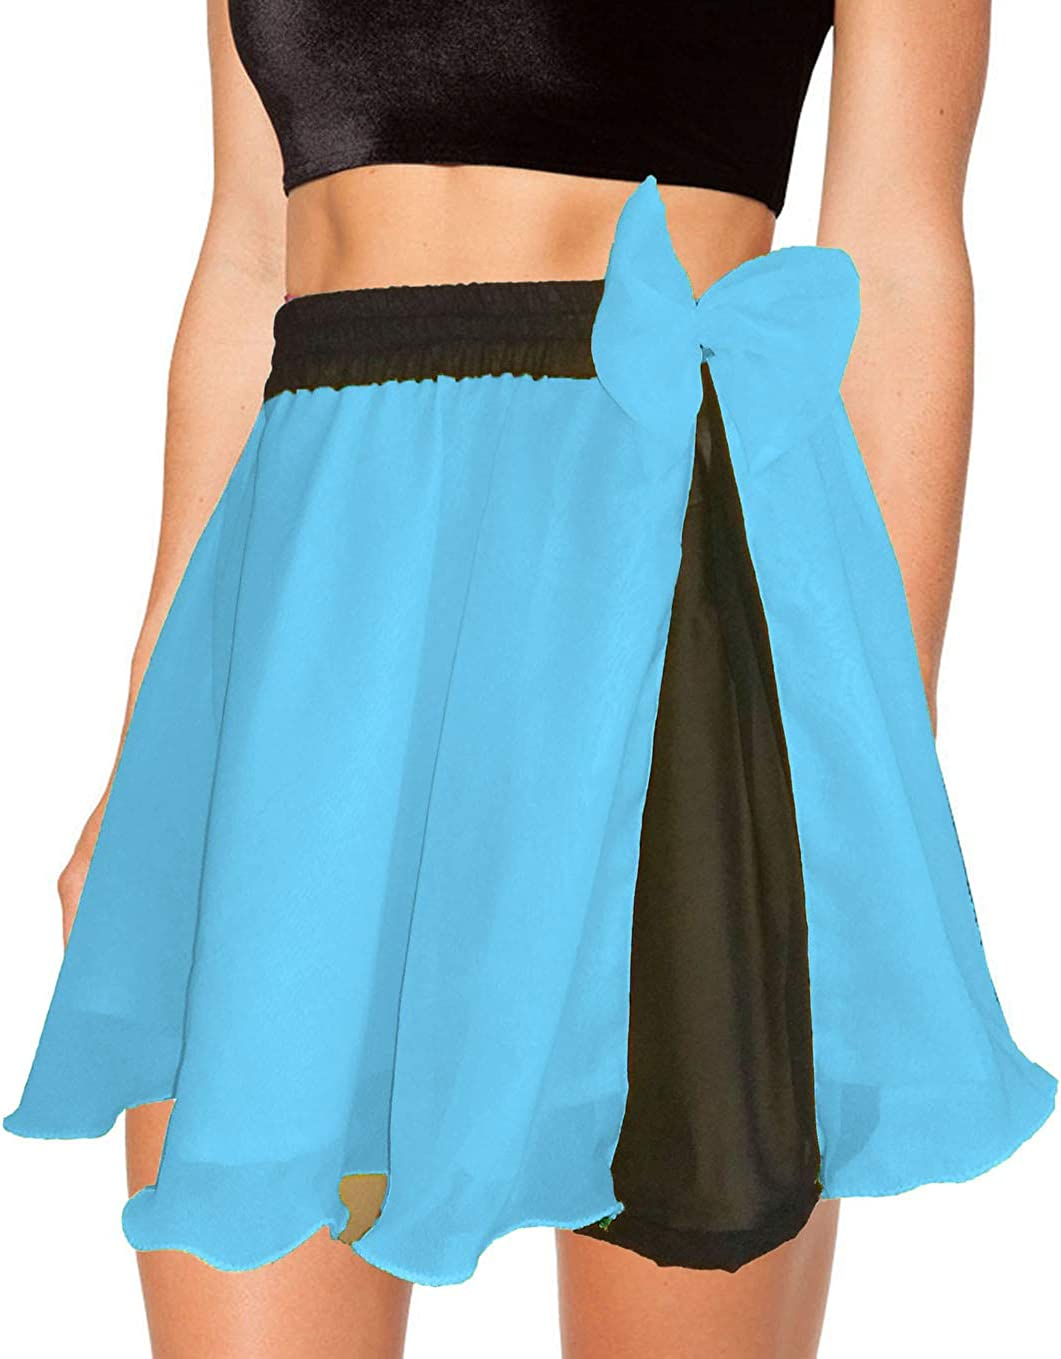 Meek Mercery Belly Dancing Pleated Short Skirts Chiffon Short Skirt Casual Wear Skirt C11